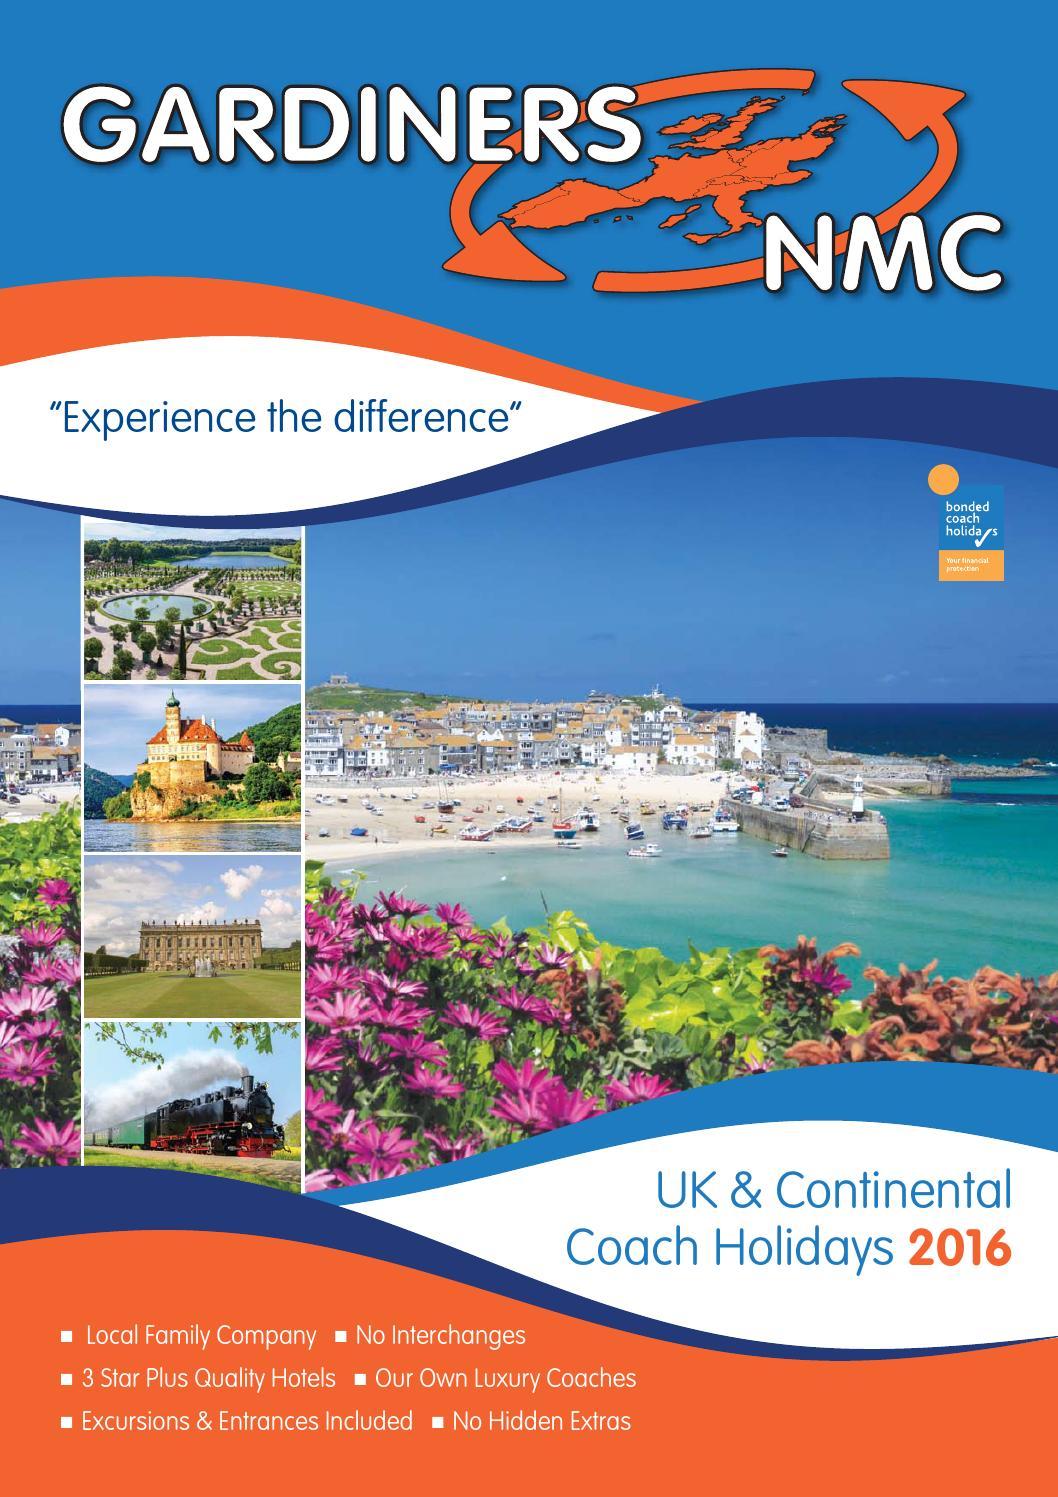 Gardiners NMC UK & Continental Coach Holidays 2016 by Chris Pangburn ...